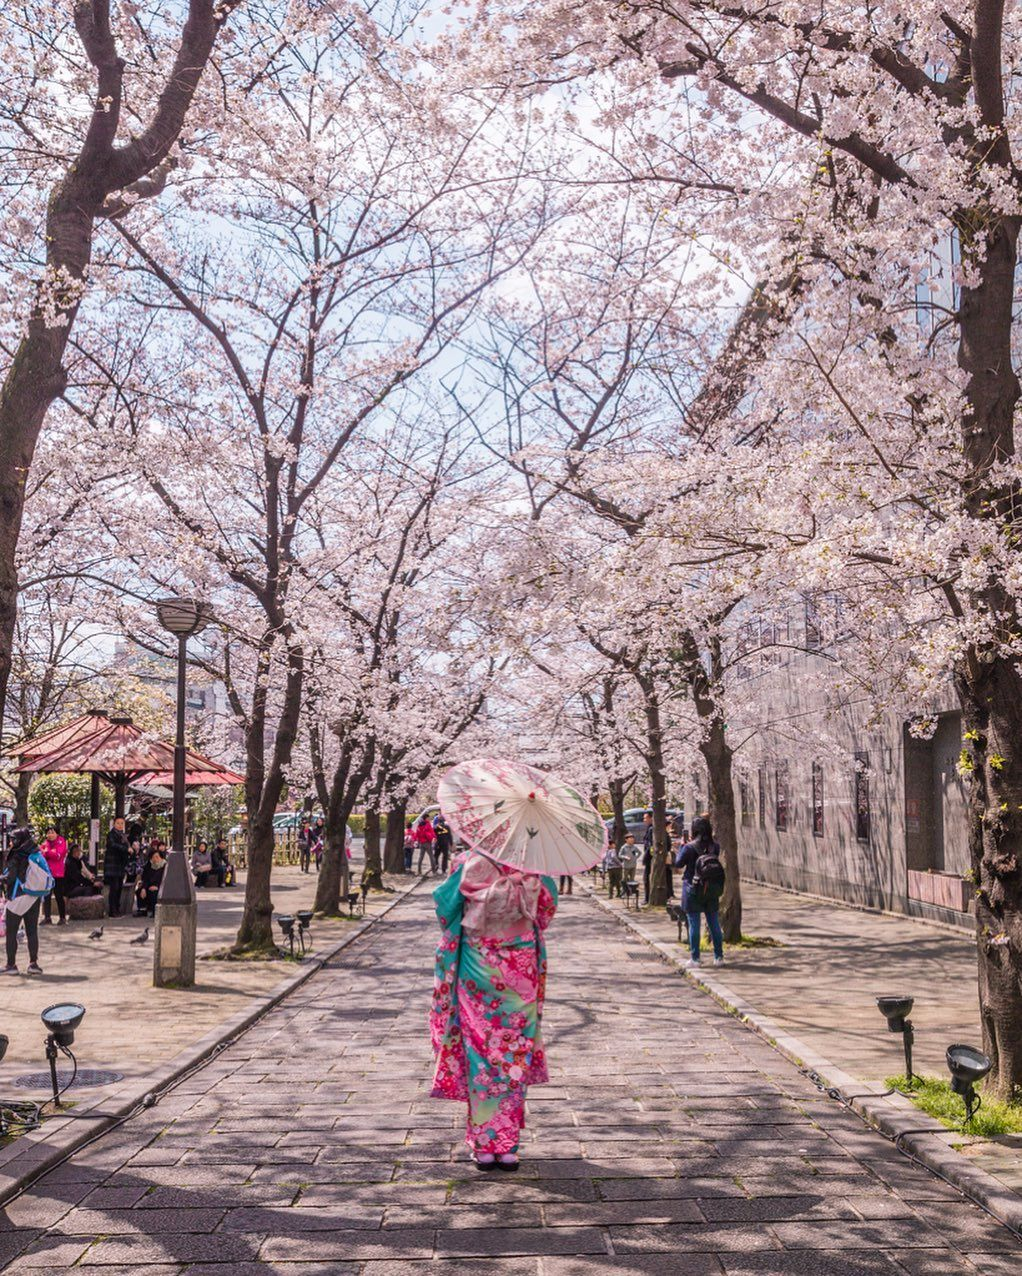 Cherry Blossoms In Gion District Kyoto Hermosos Paisajes Fotos Artisticas Paisajes